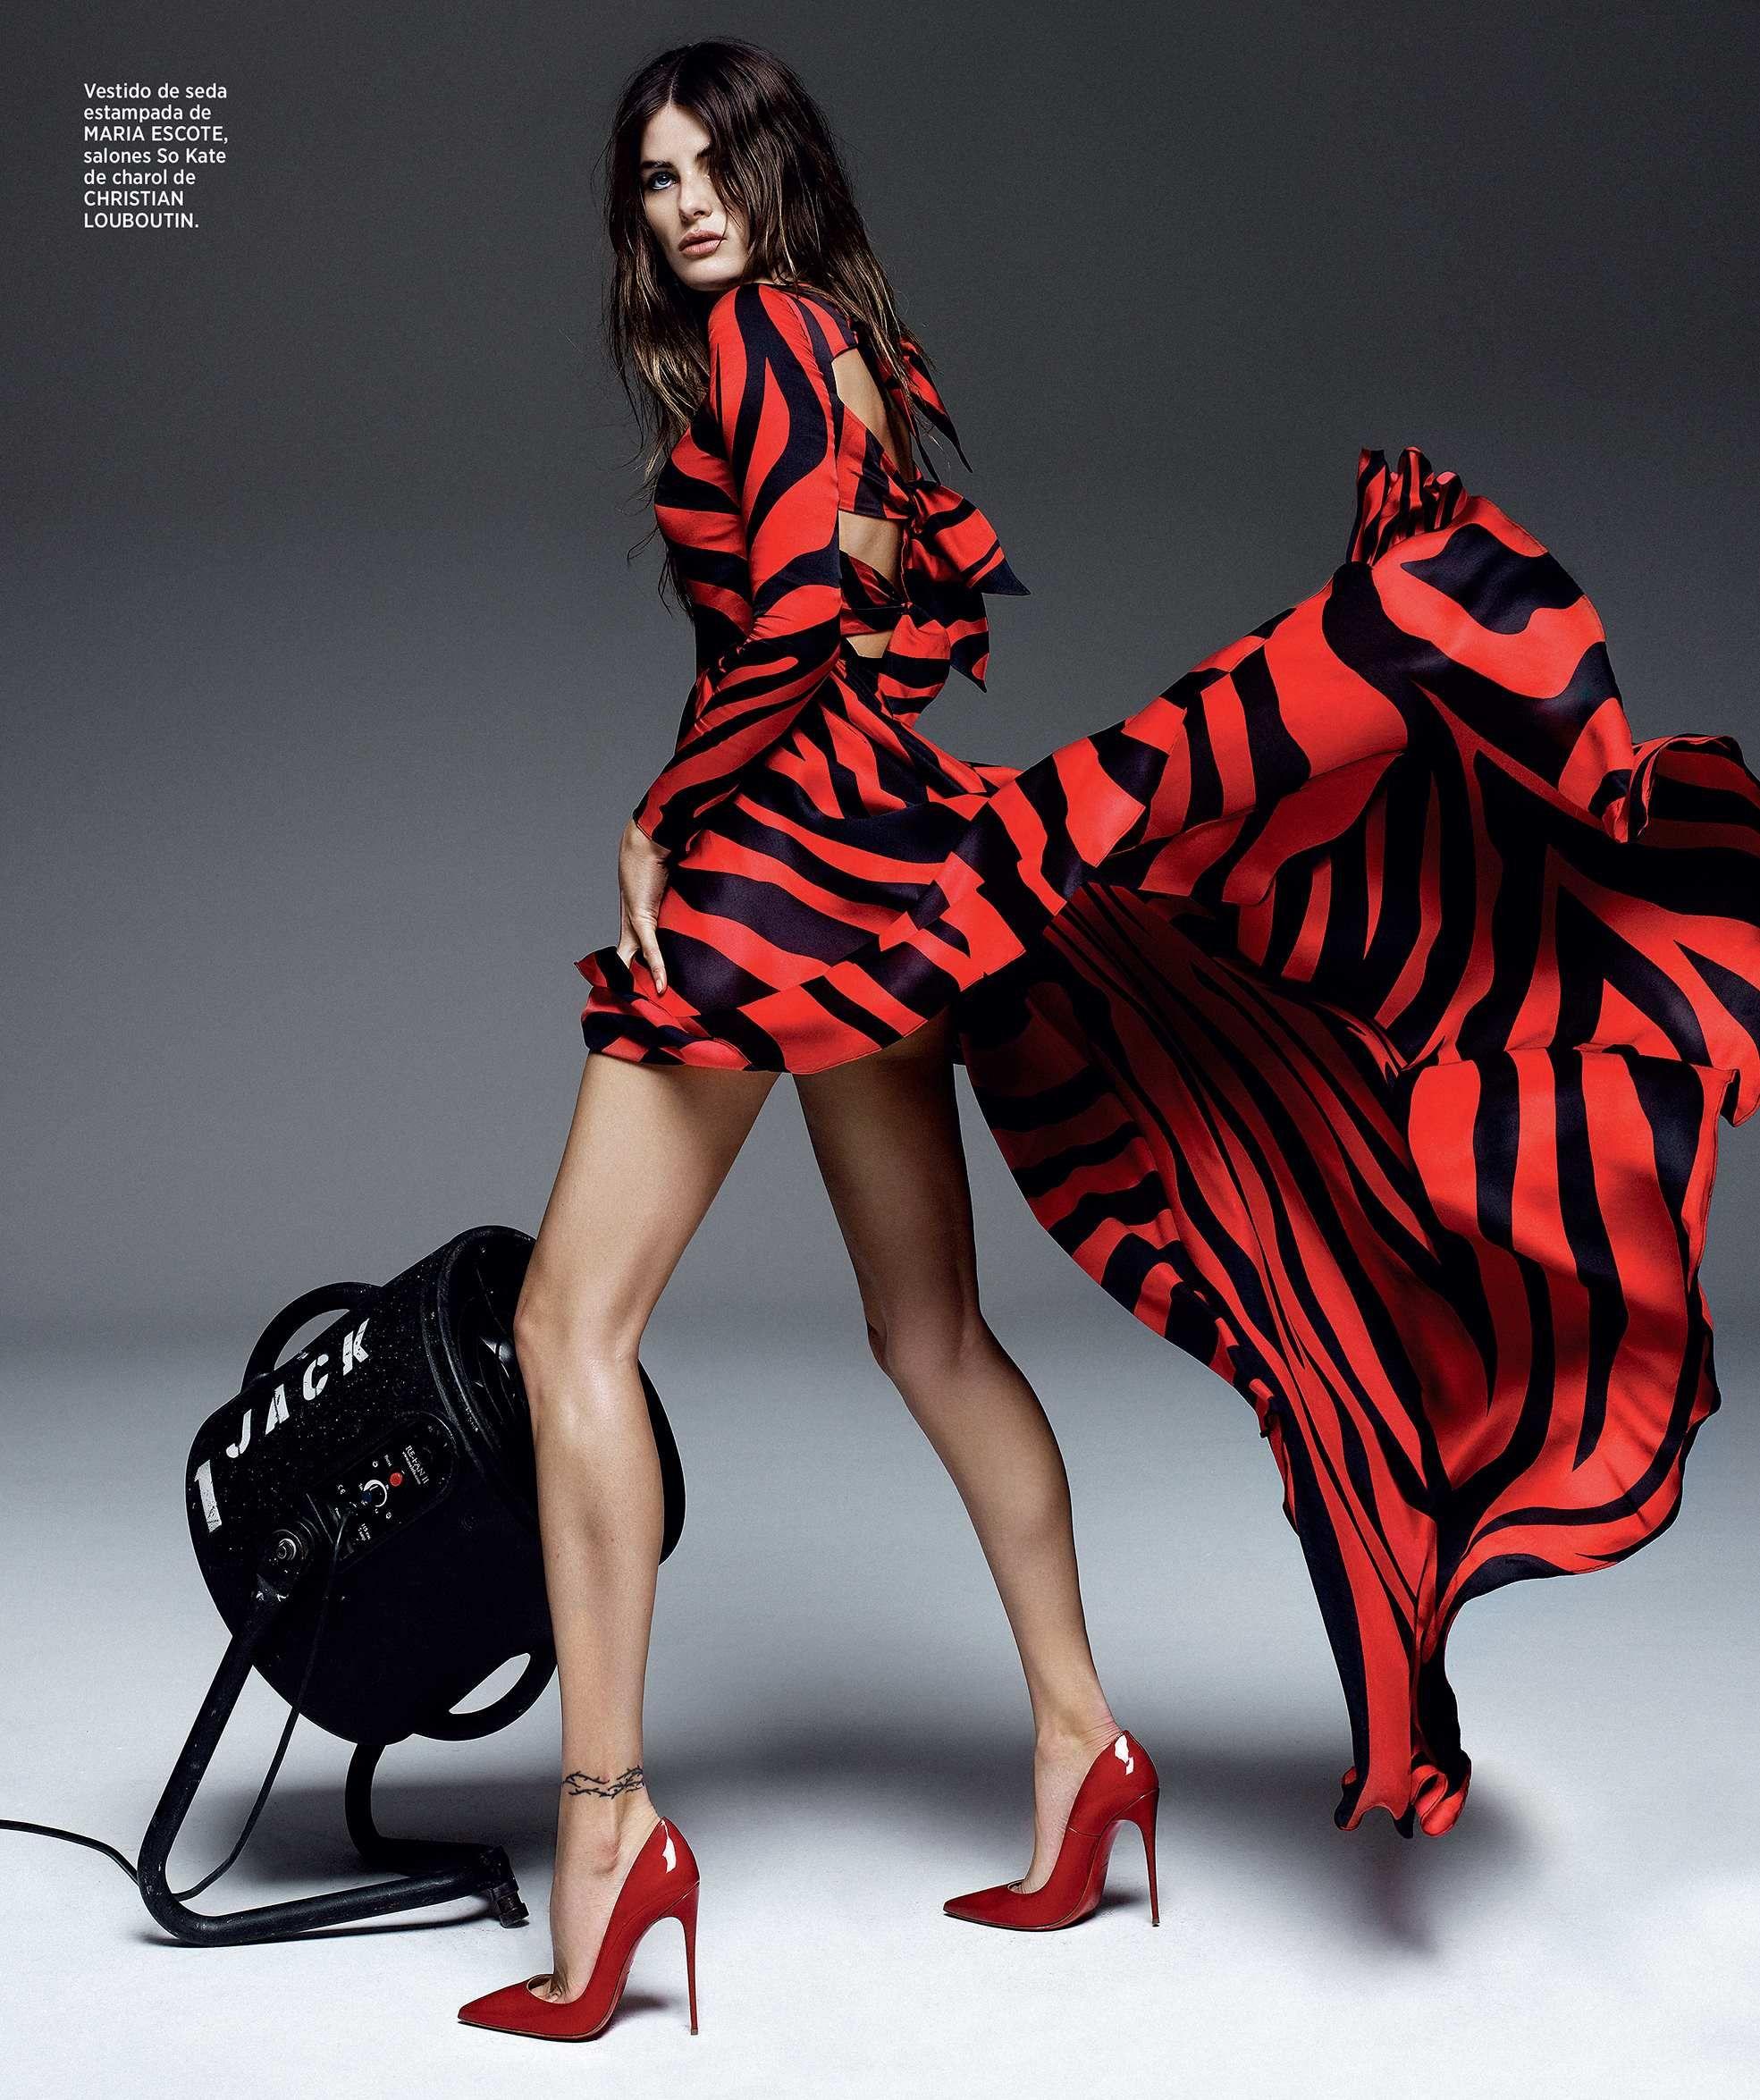 Fashion photography salary - how do such photographers earn?